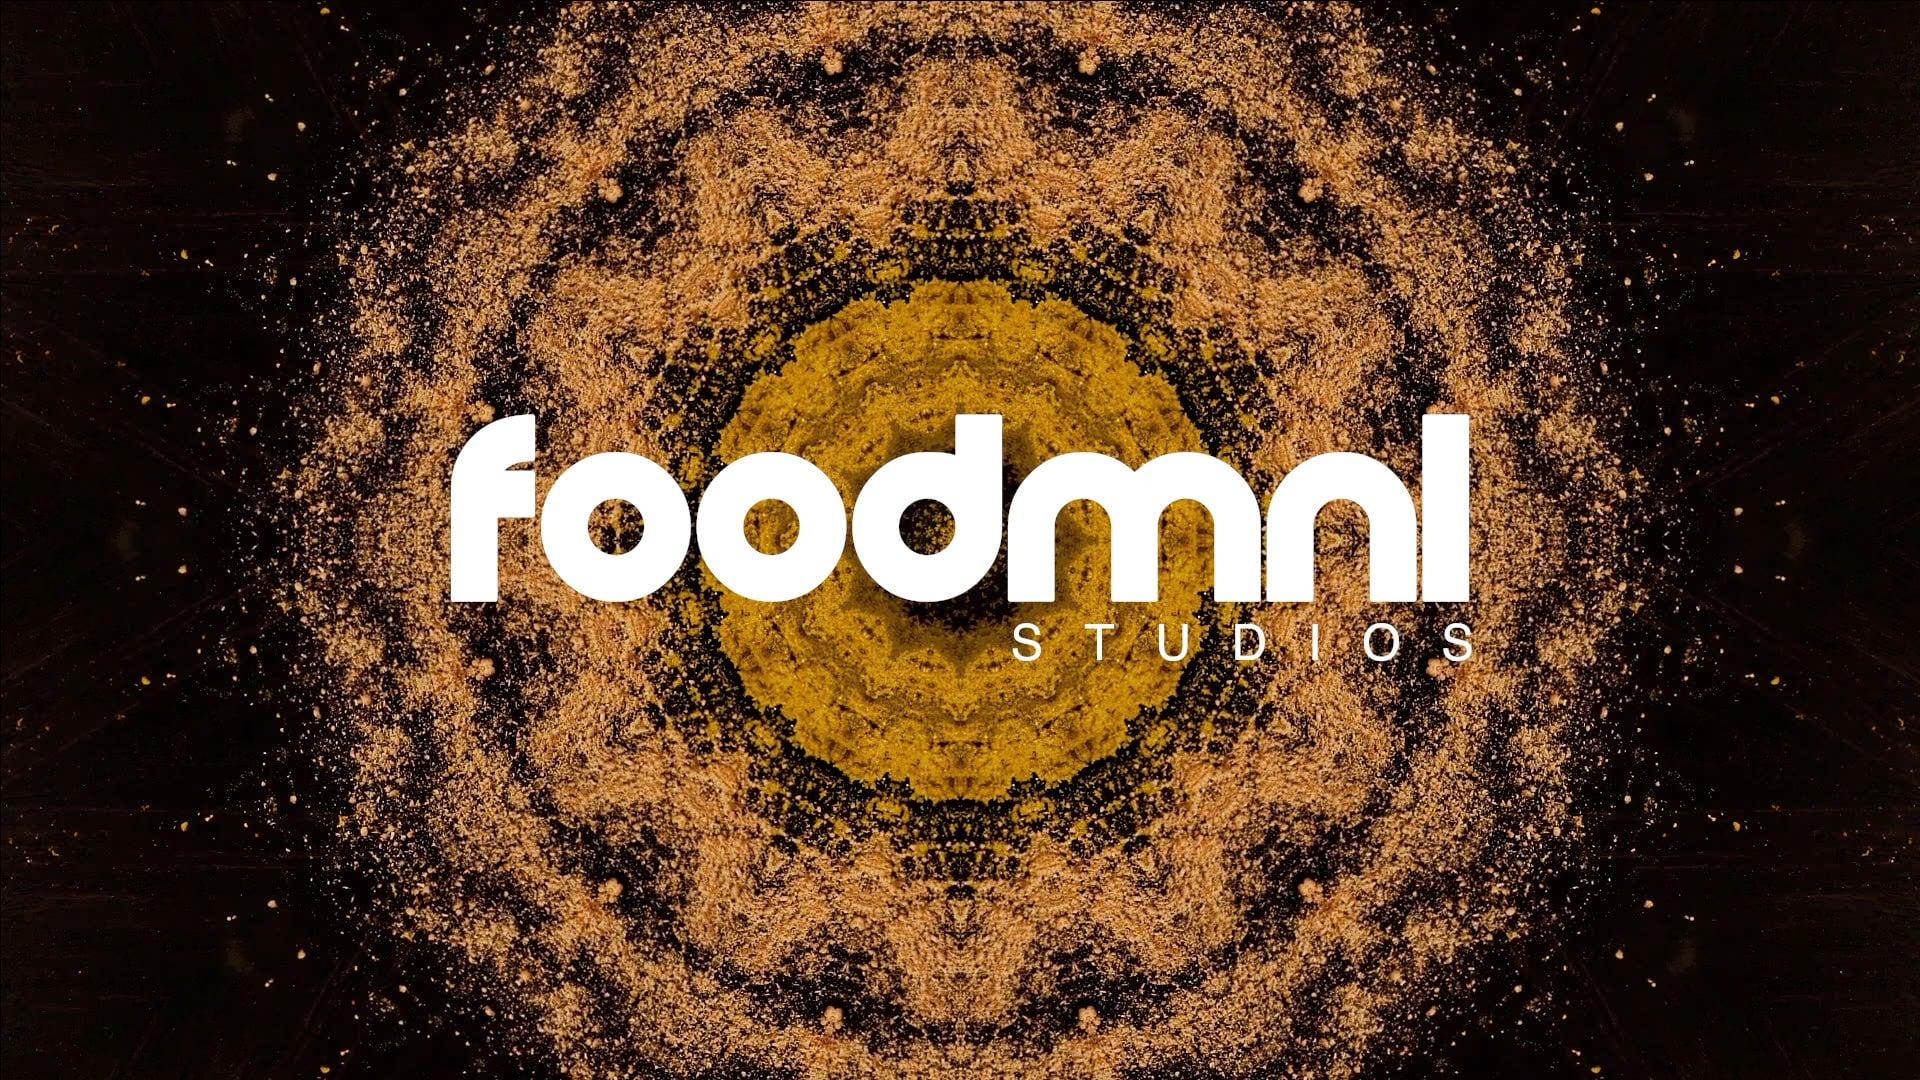 Foodmnl Studios | Turn on the Fire!